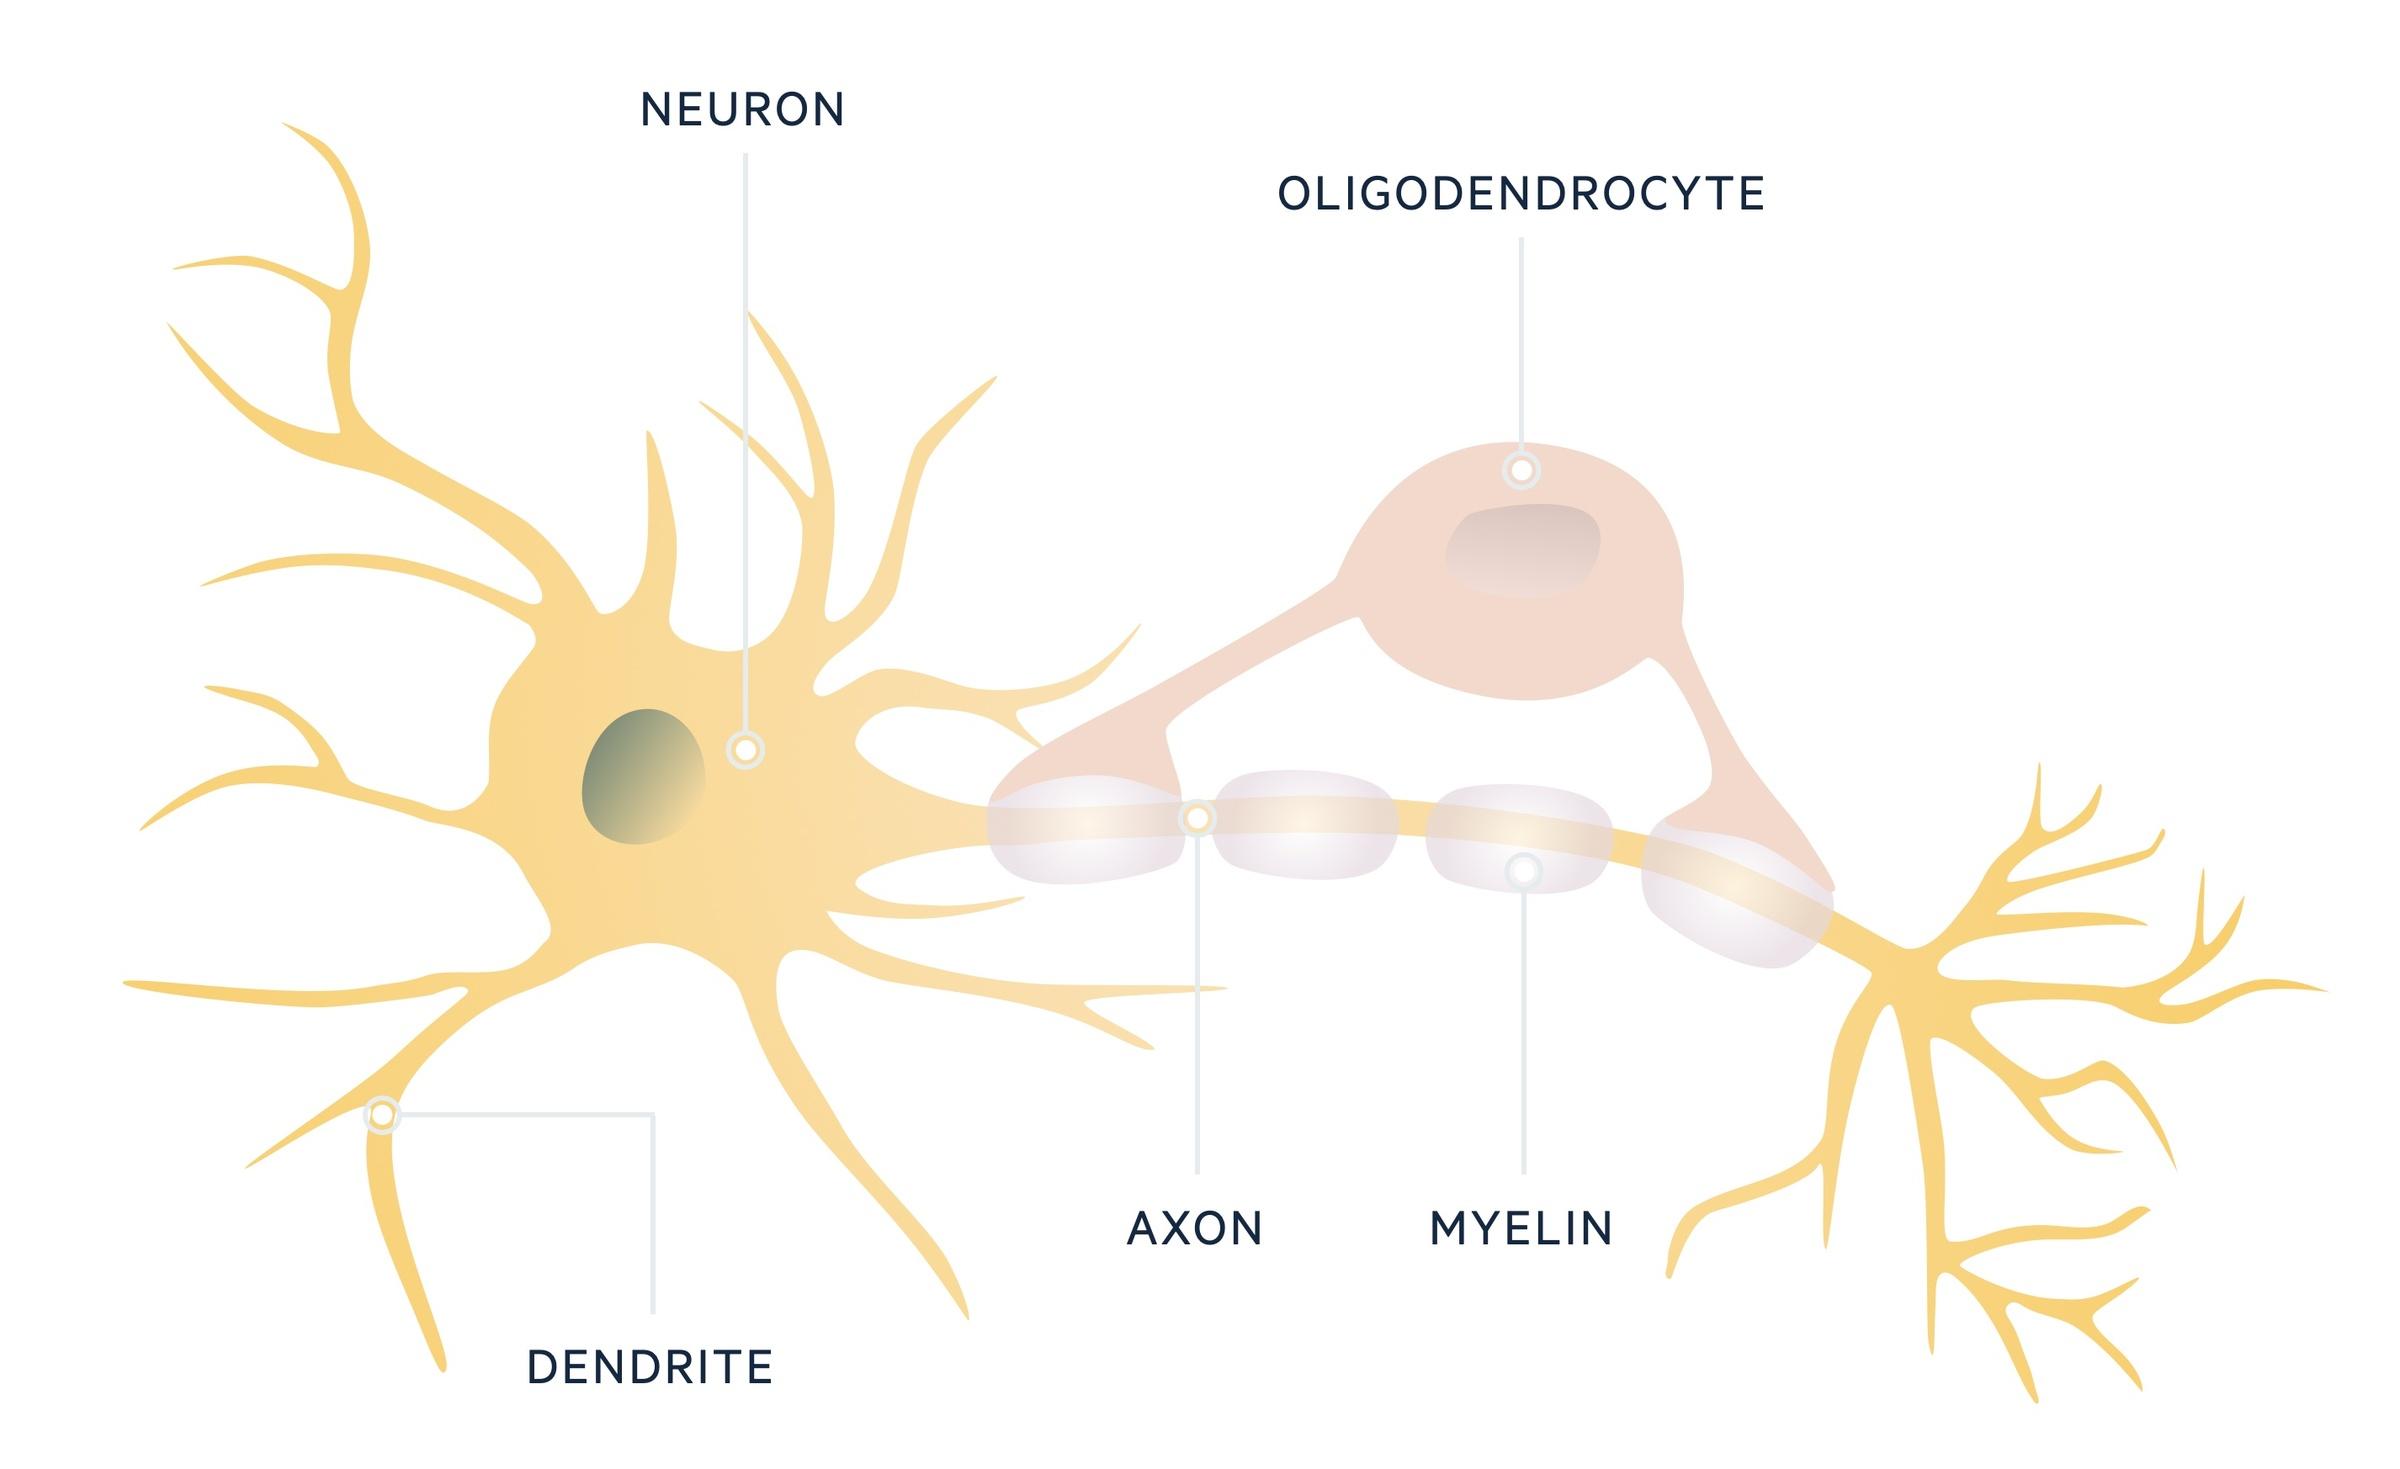 Neuron and oligodendrocyte